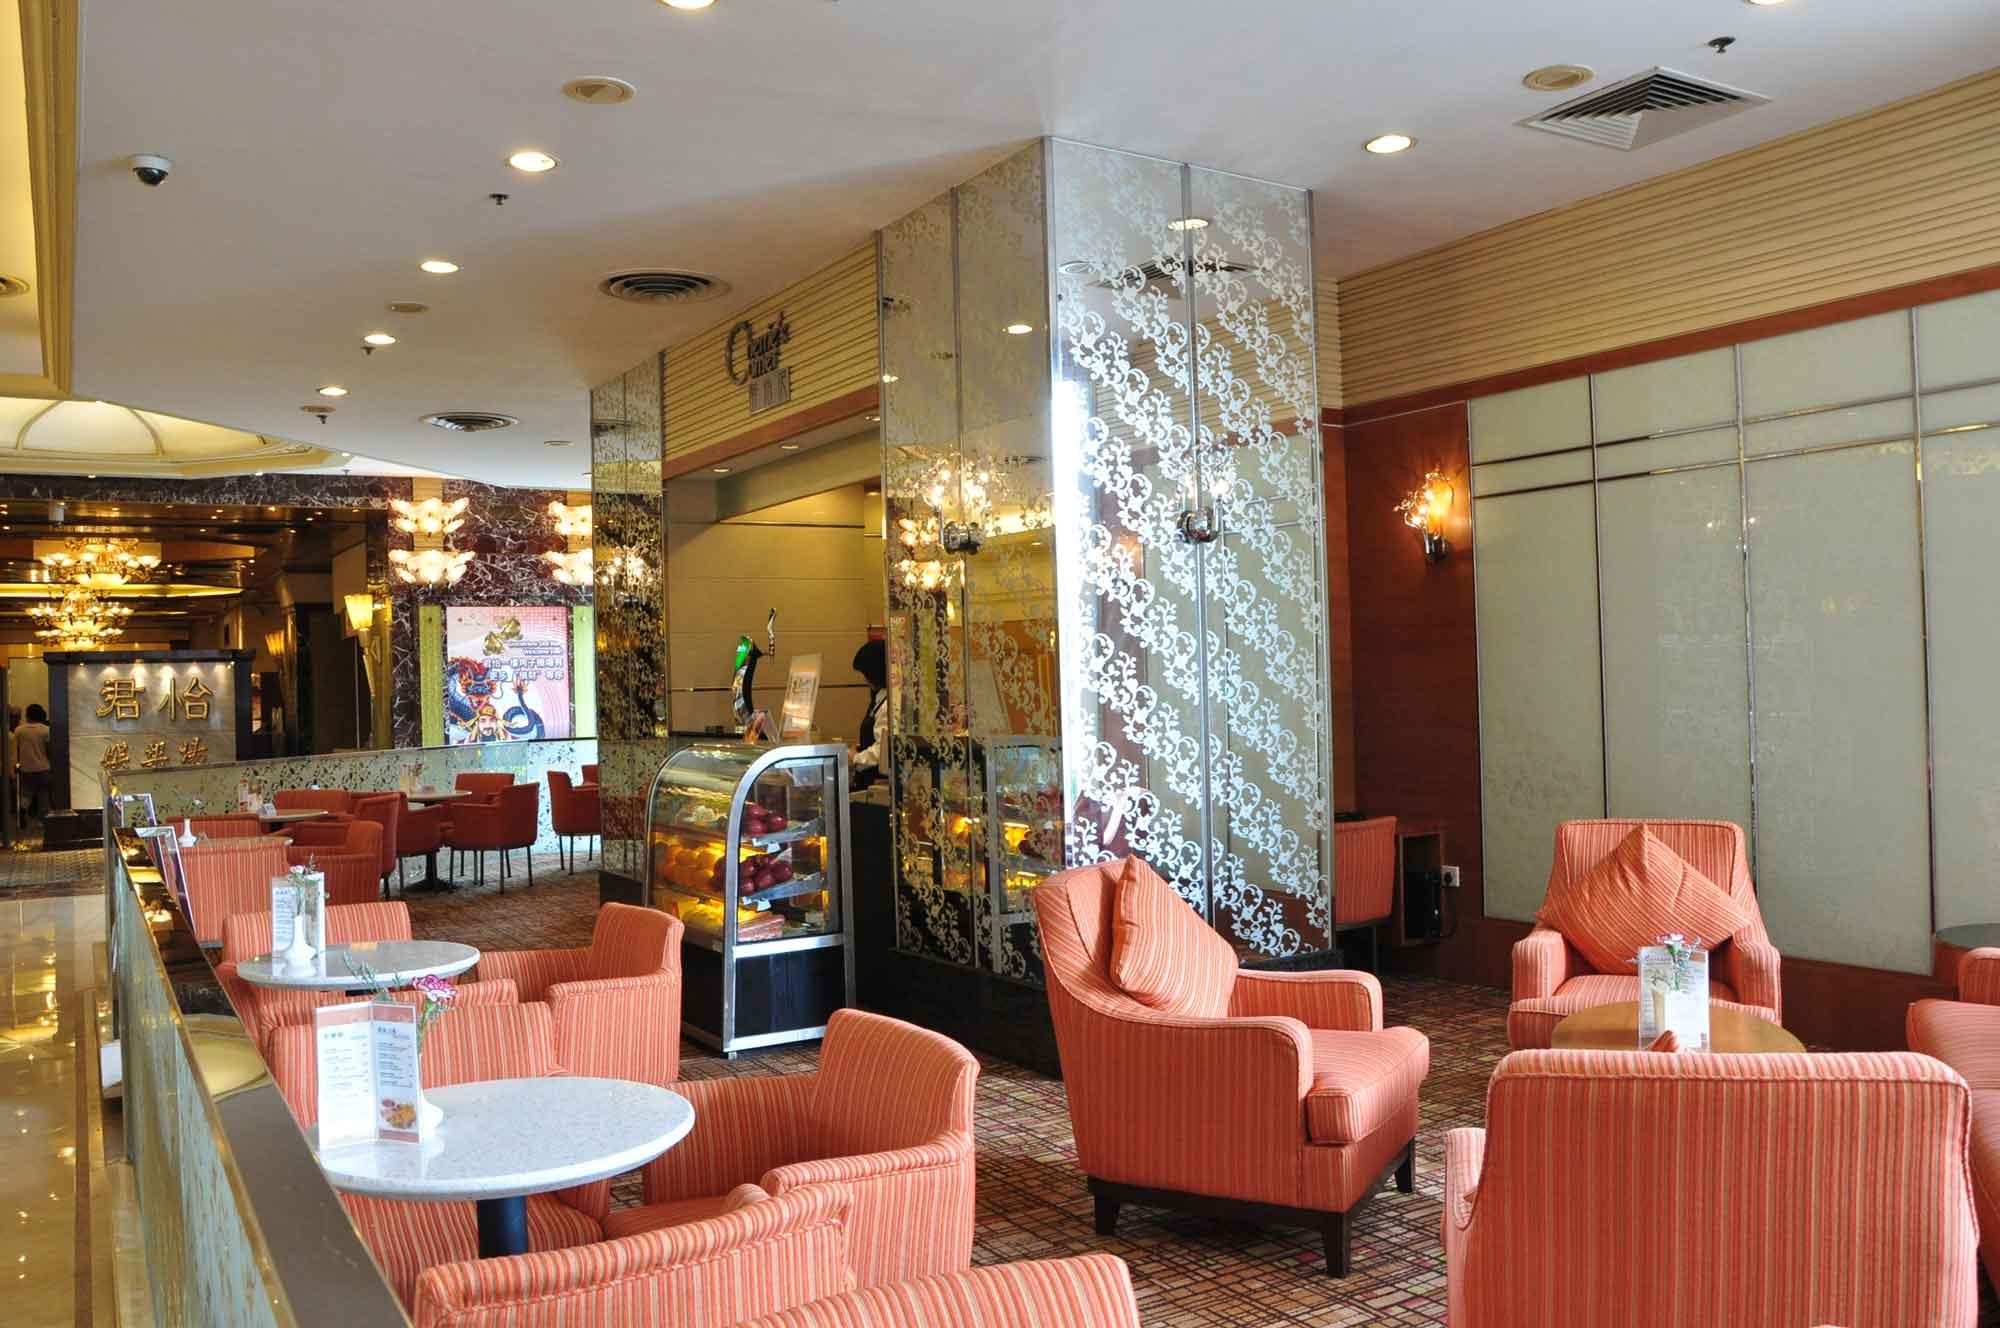 Grandview Hotel Macau Cherrie's Corner seating